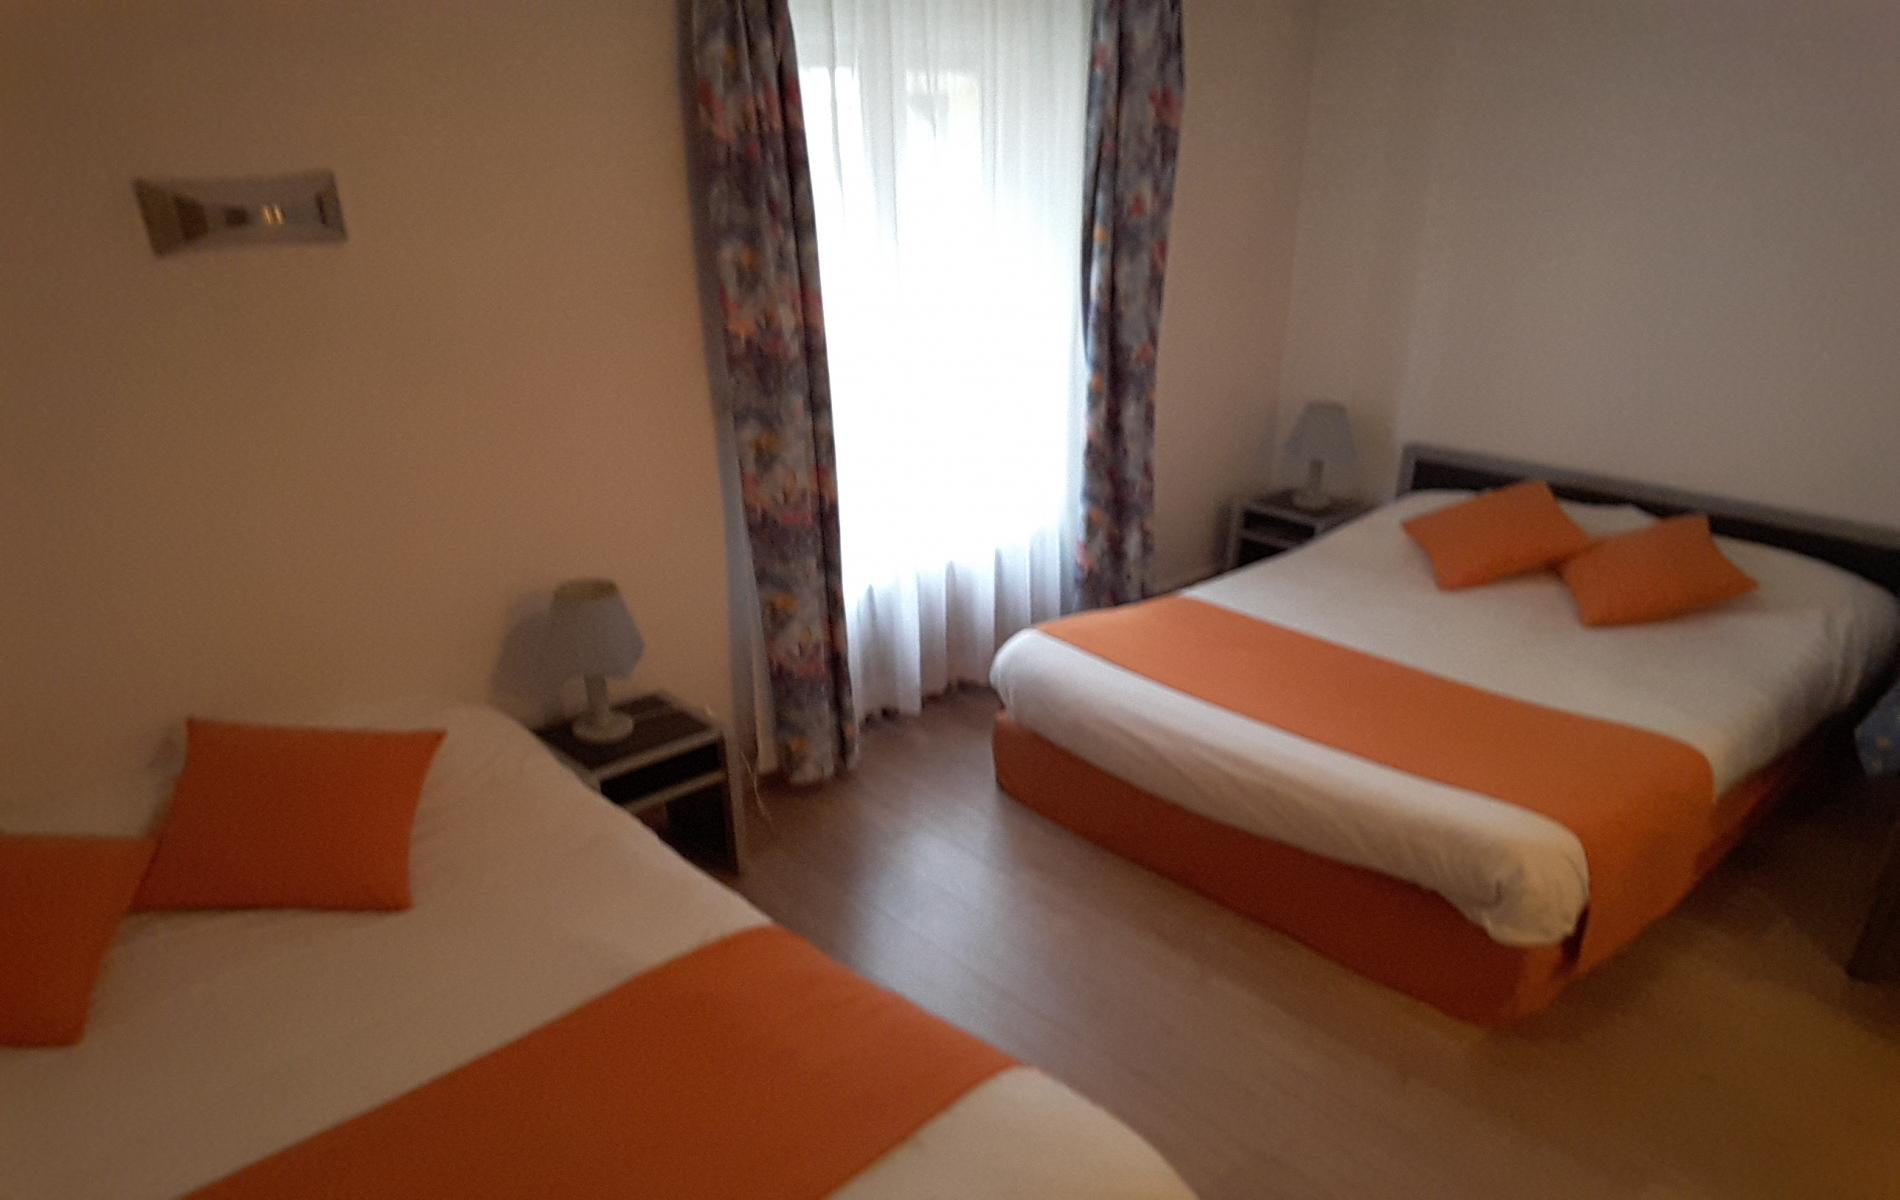 Hotel entre le mans et alen on chambres twin double familiales for Chambre twin